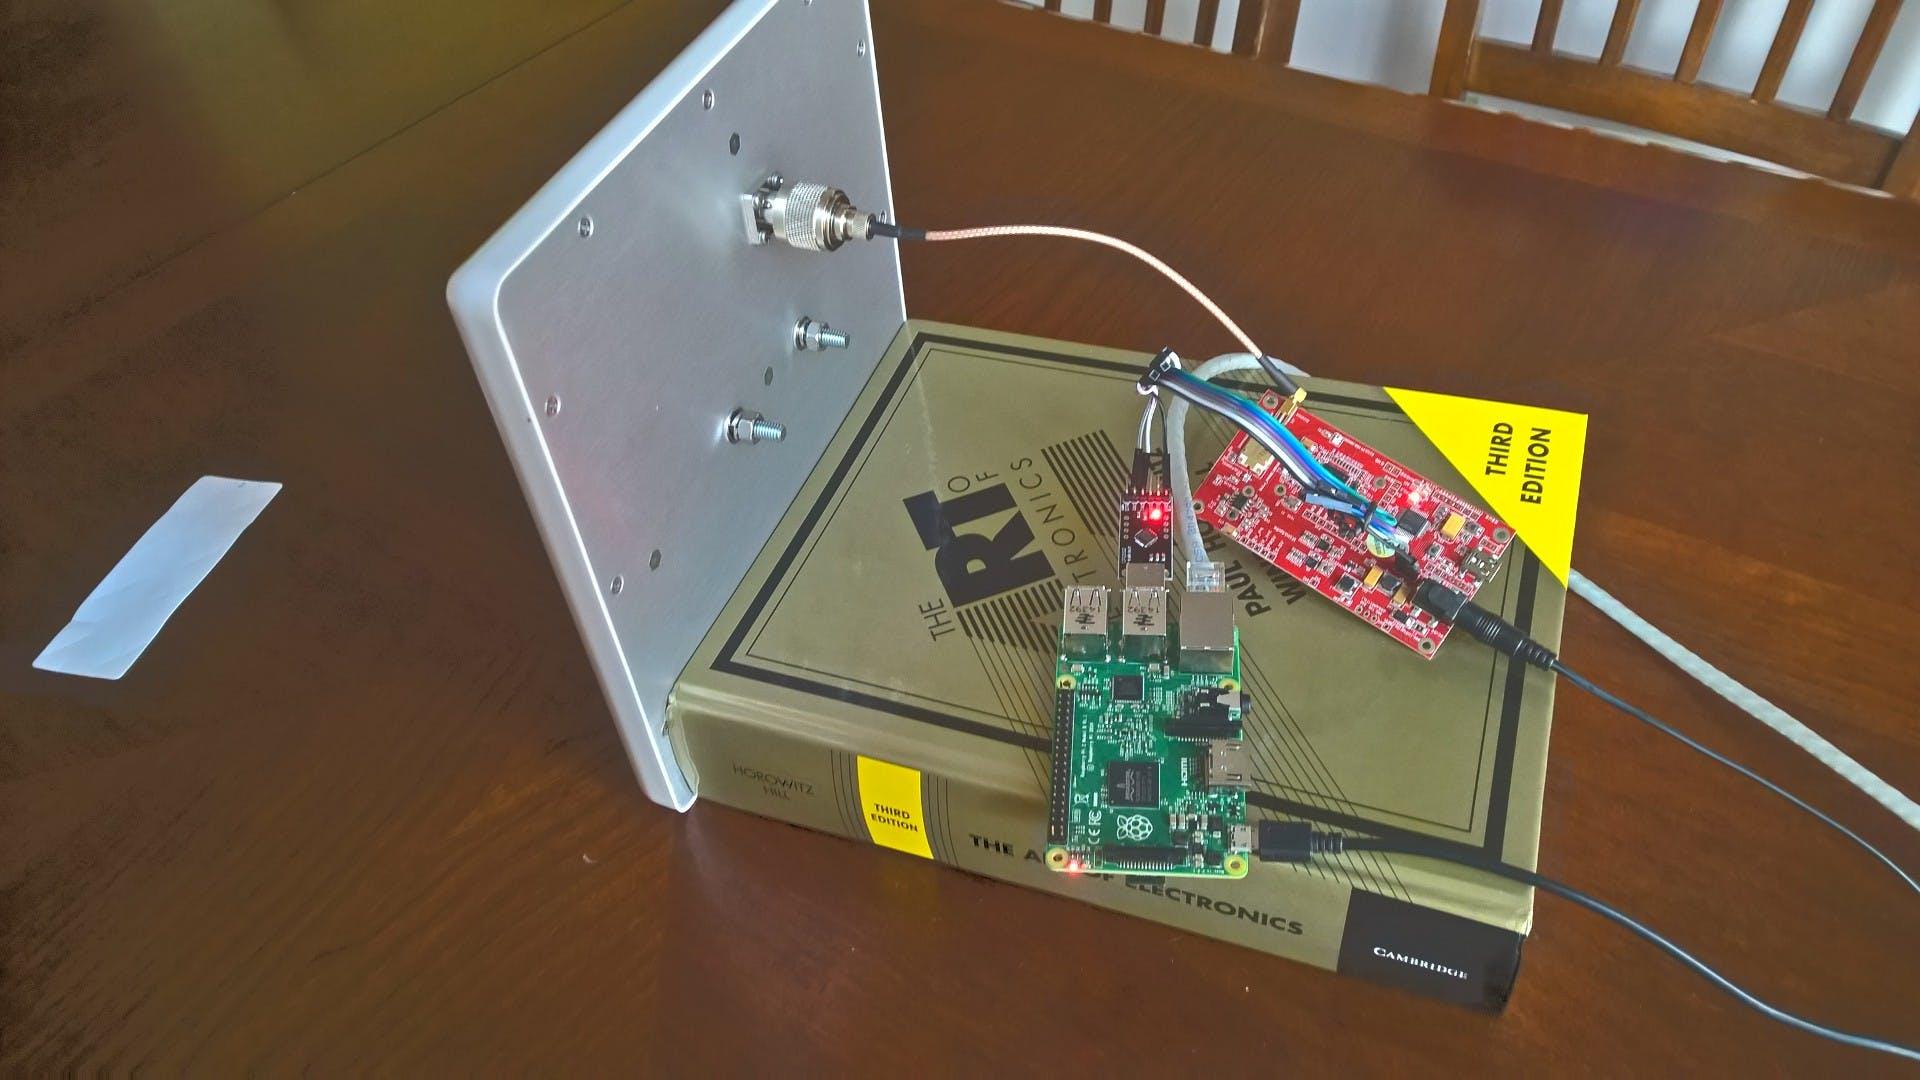 Long Range Uhf Rfid Item Tracking System Hackster Io